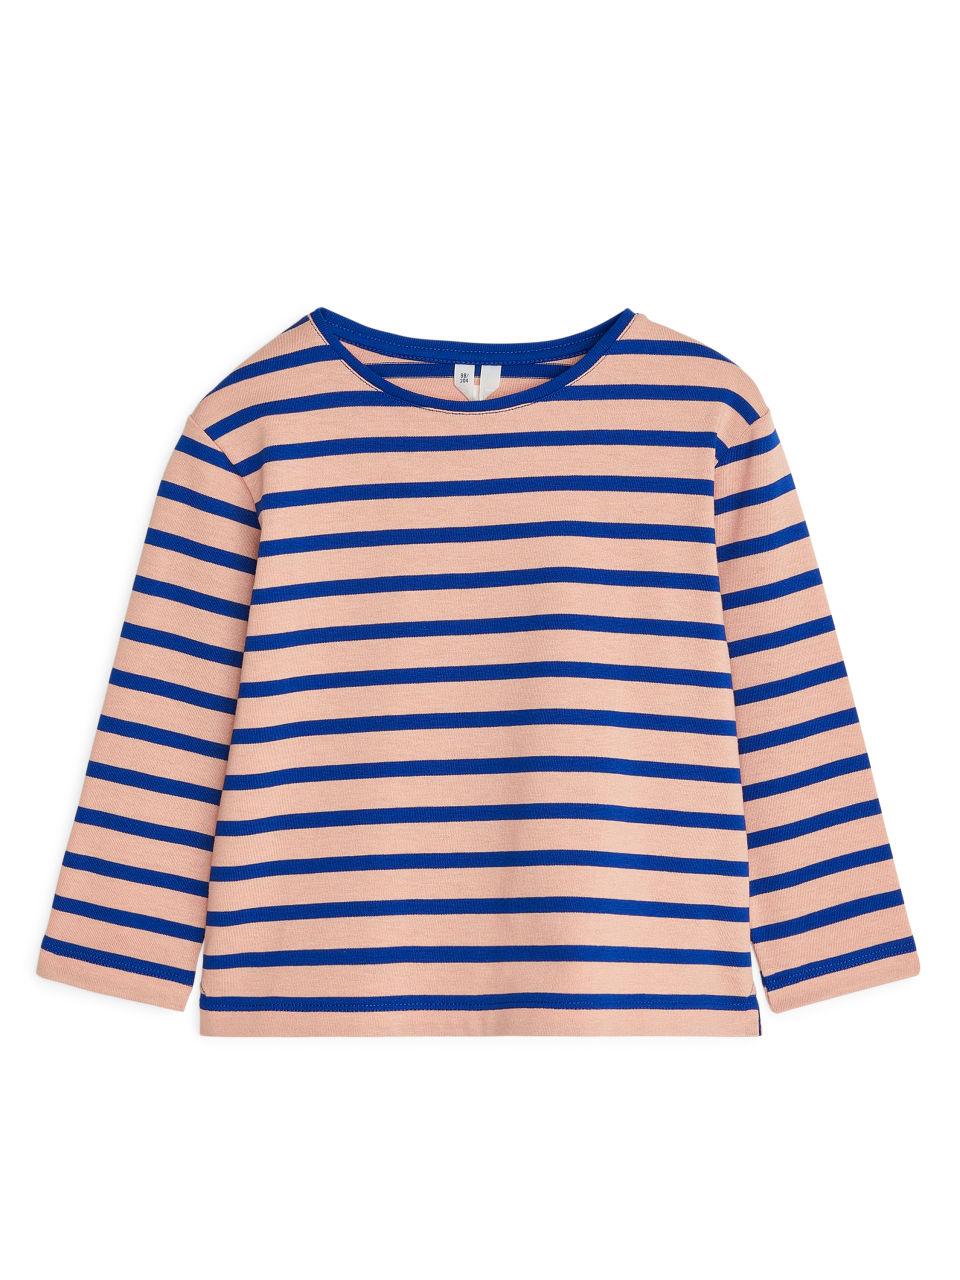 Striped Top - Orange